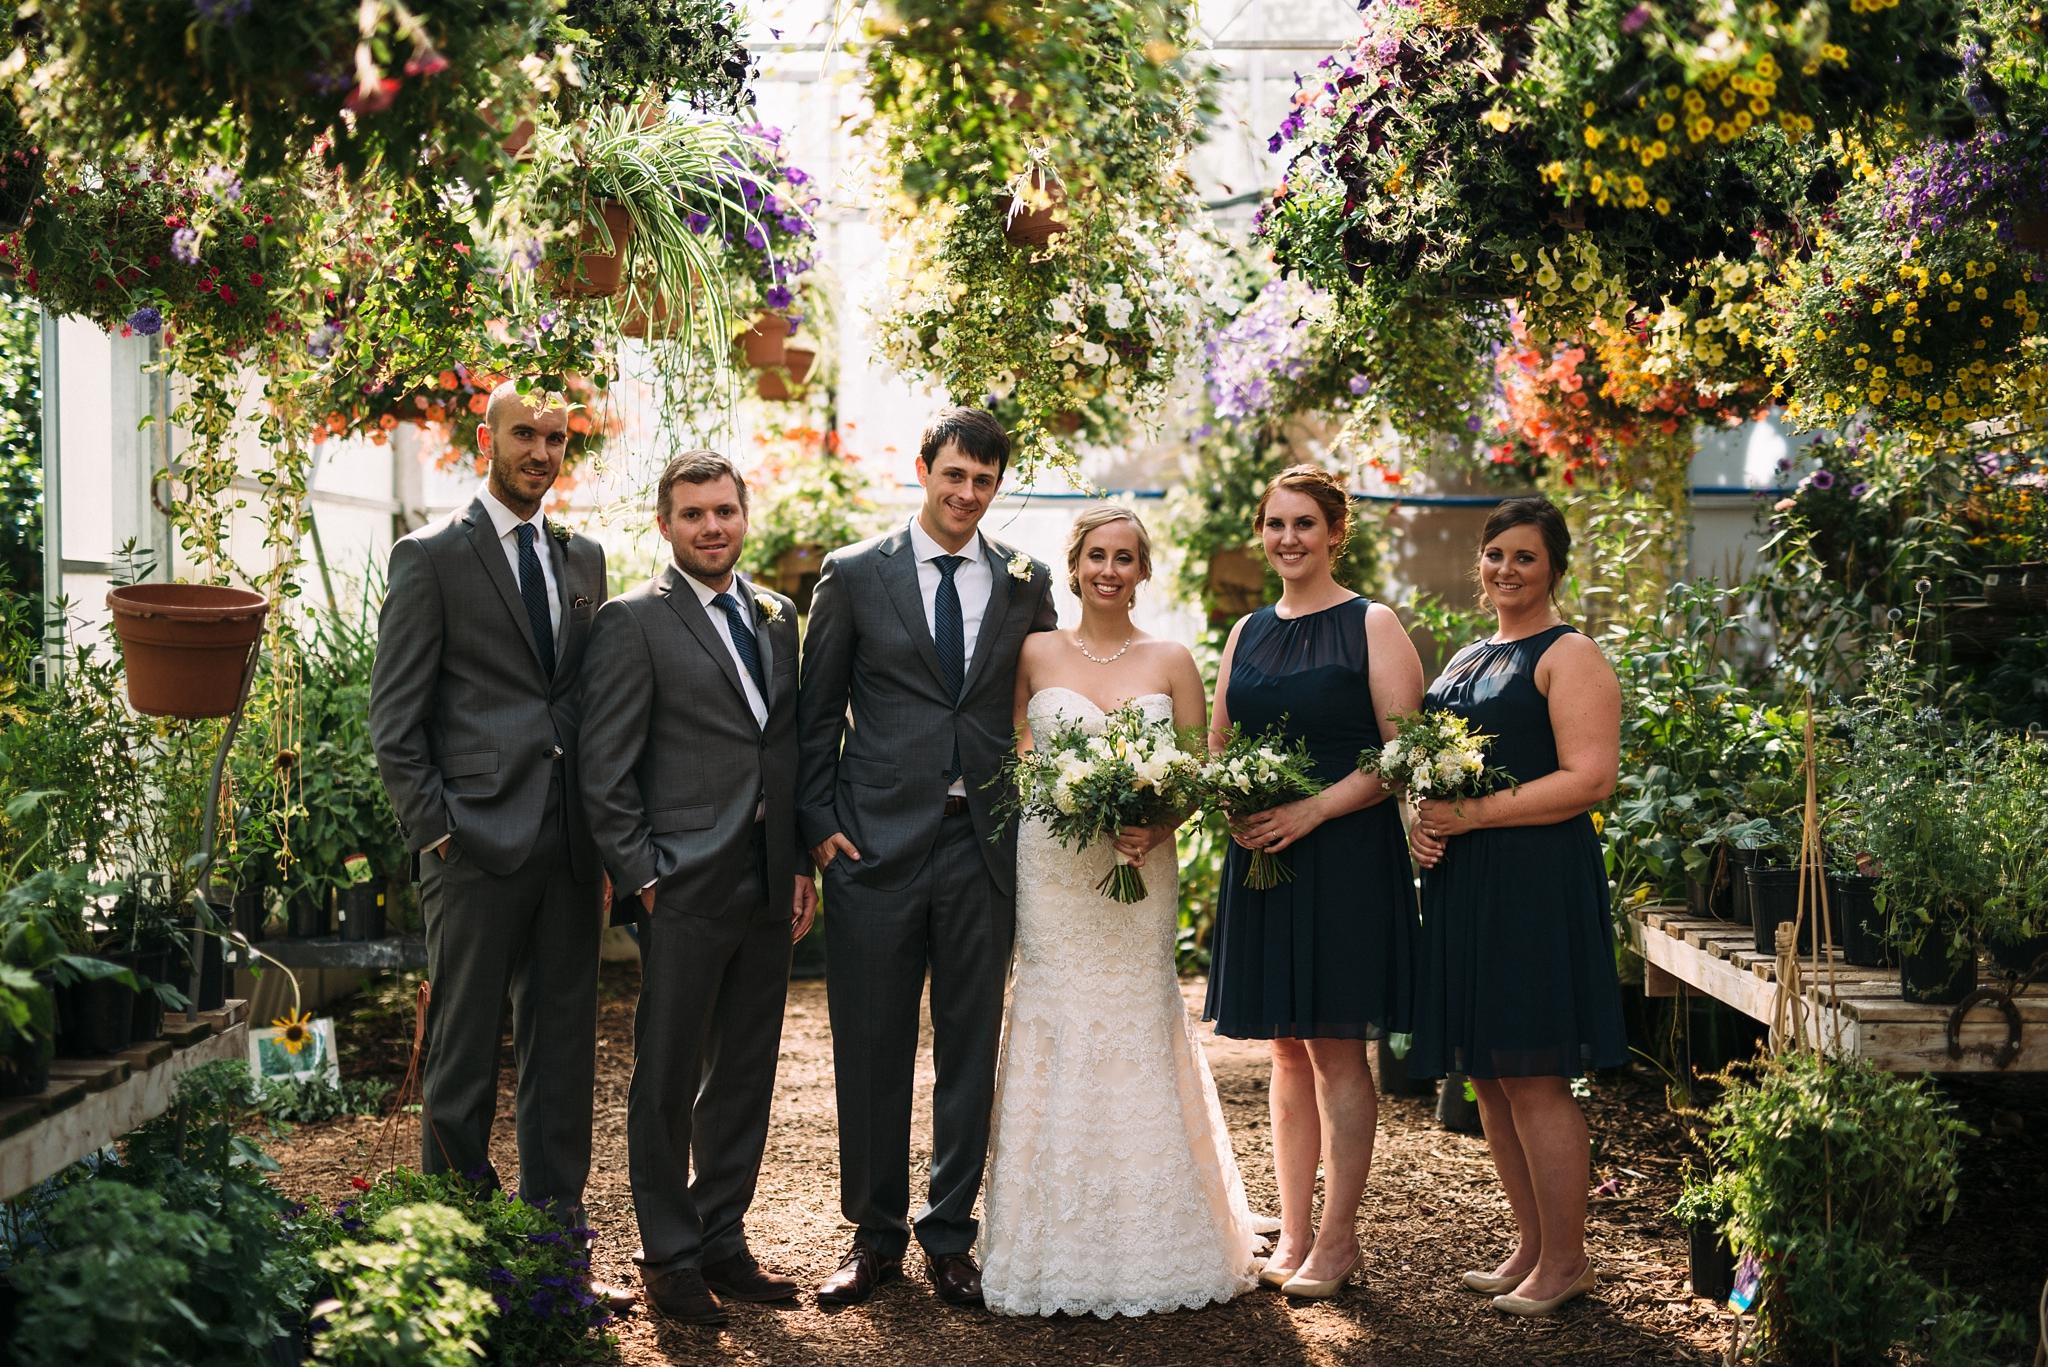 kaihla_tonai_intimate_wedding_elopement_photographer_4322